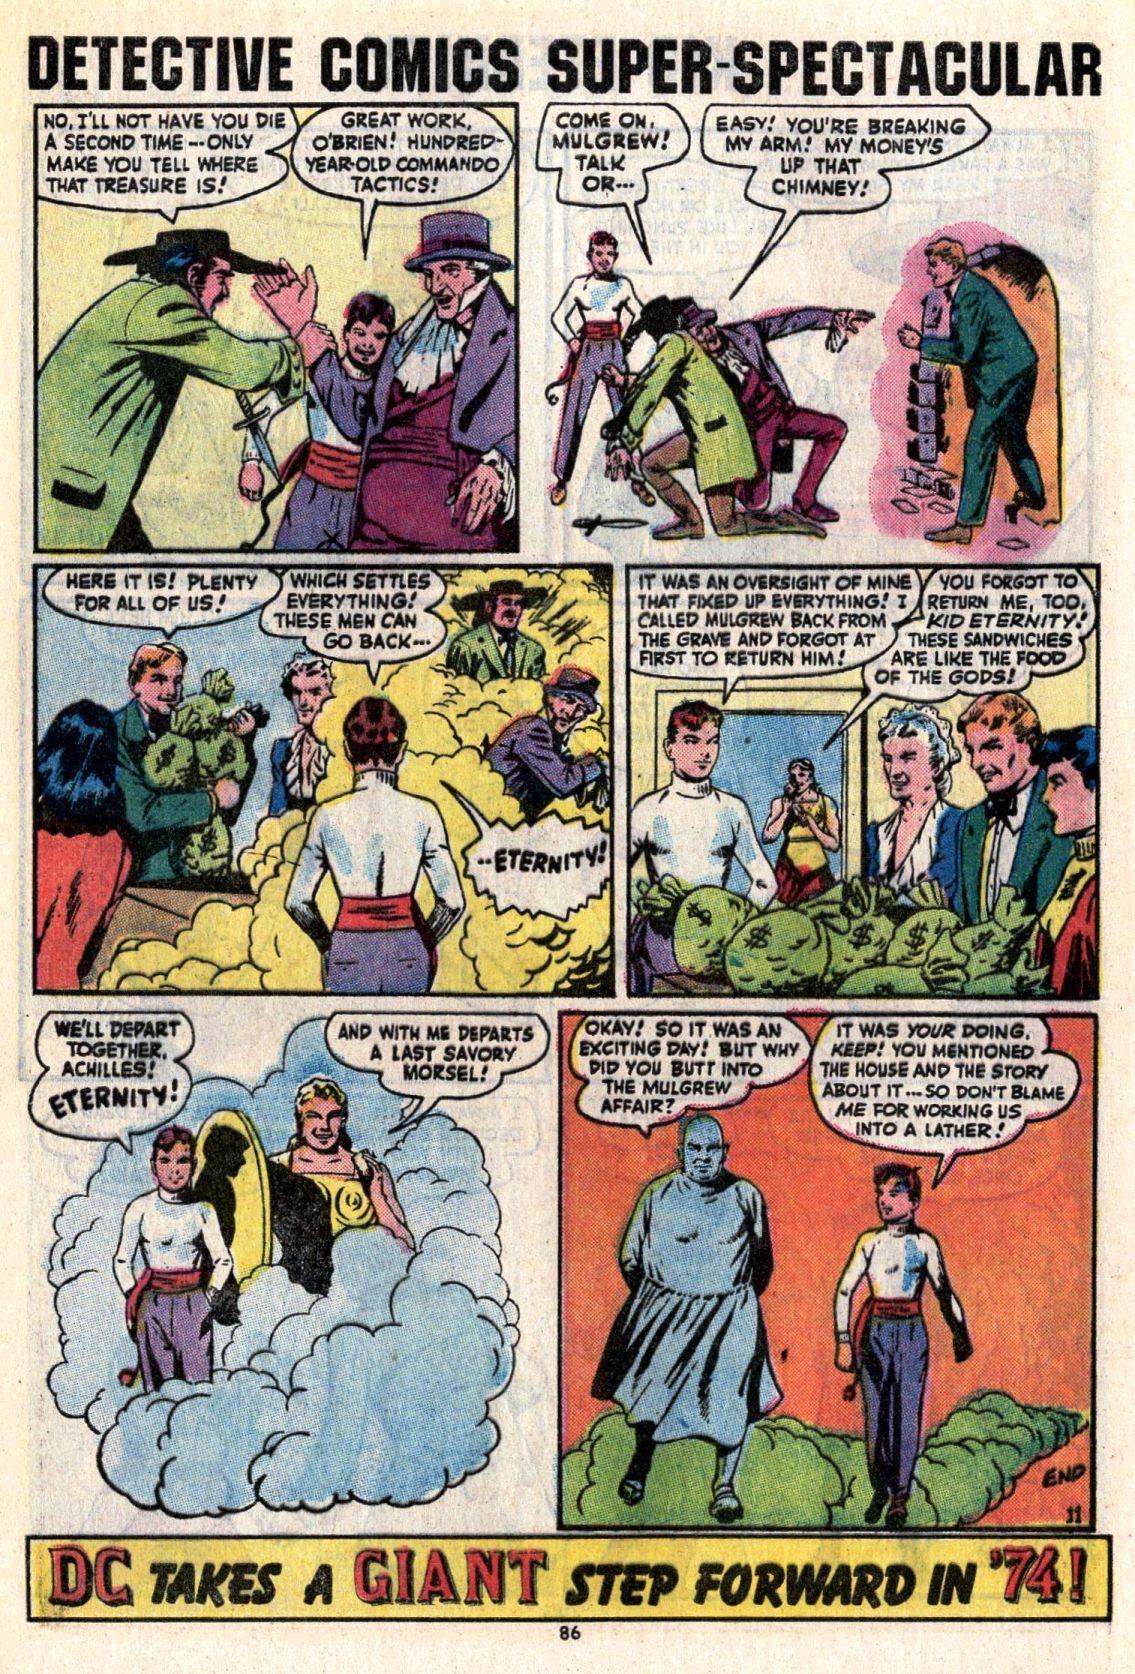 Detective Comics (1937) 439 Page 85